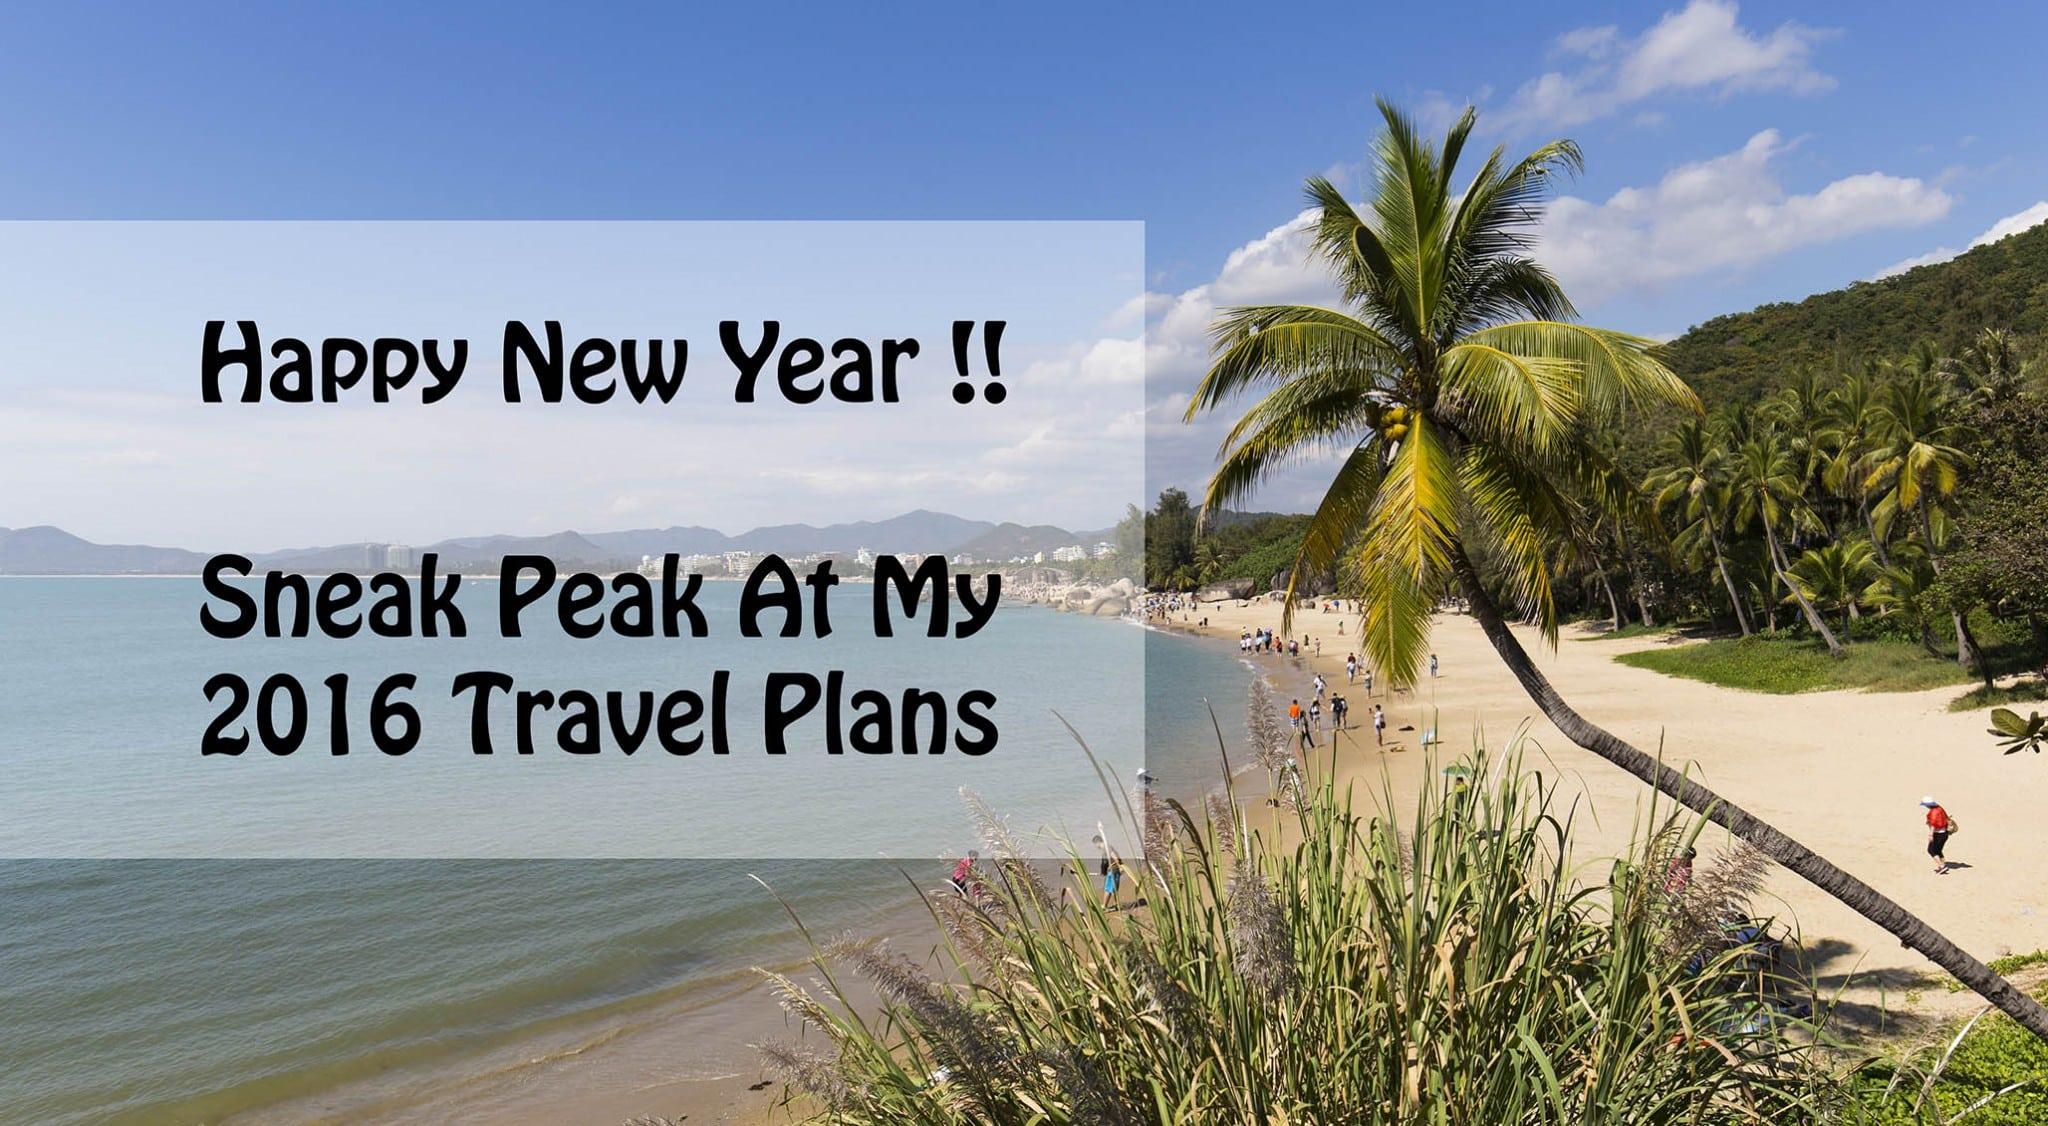 Chris Travel Blog Travel Plans 2016